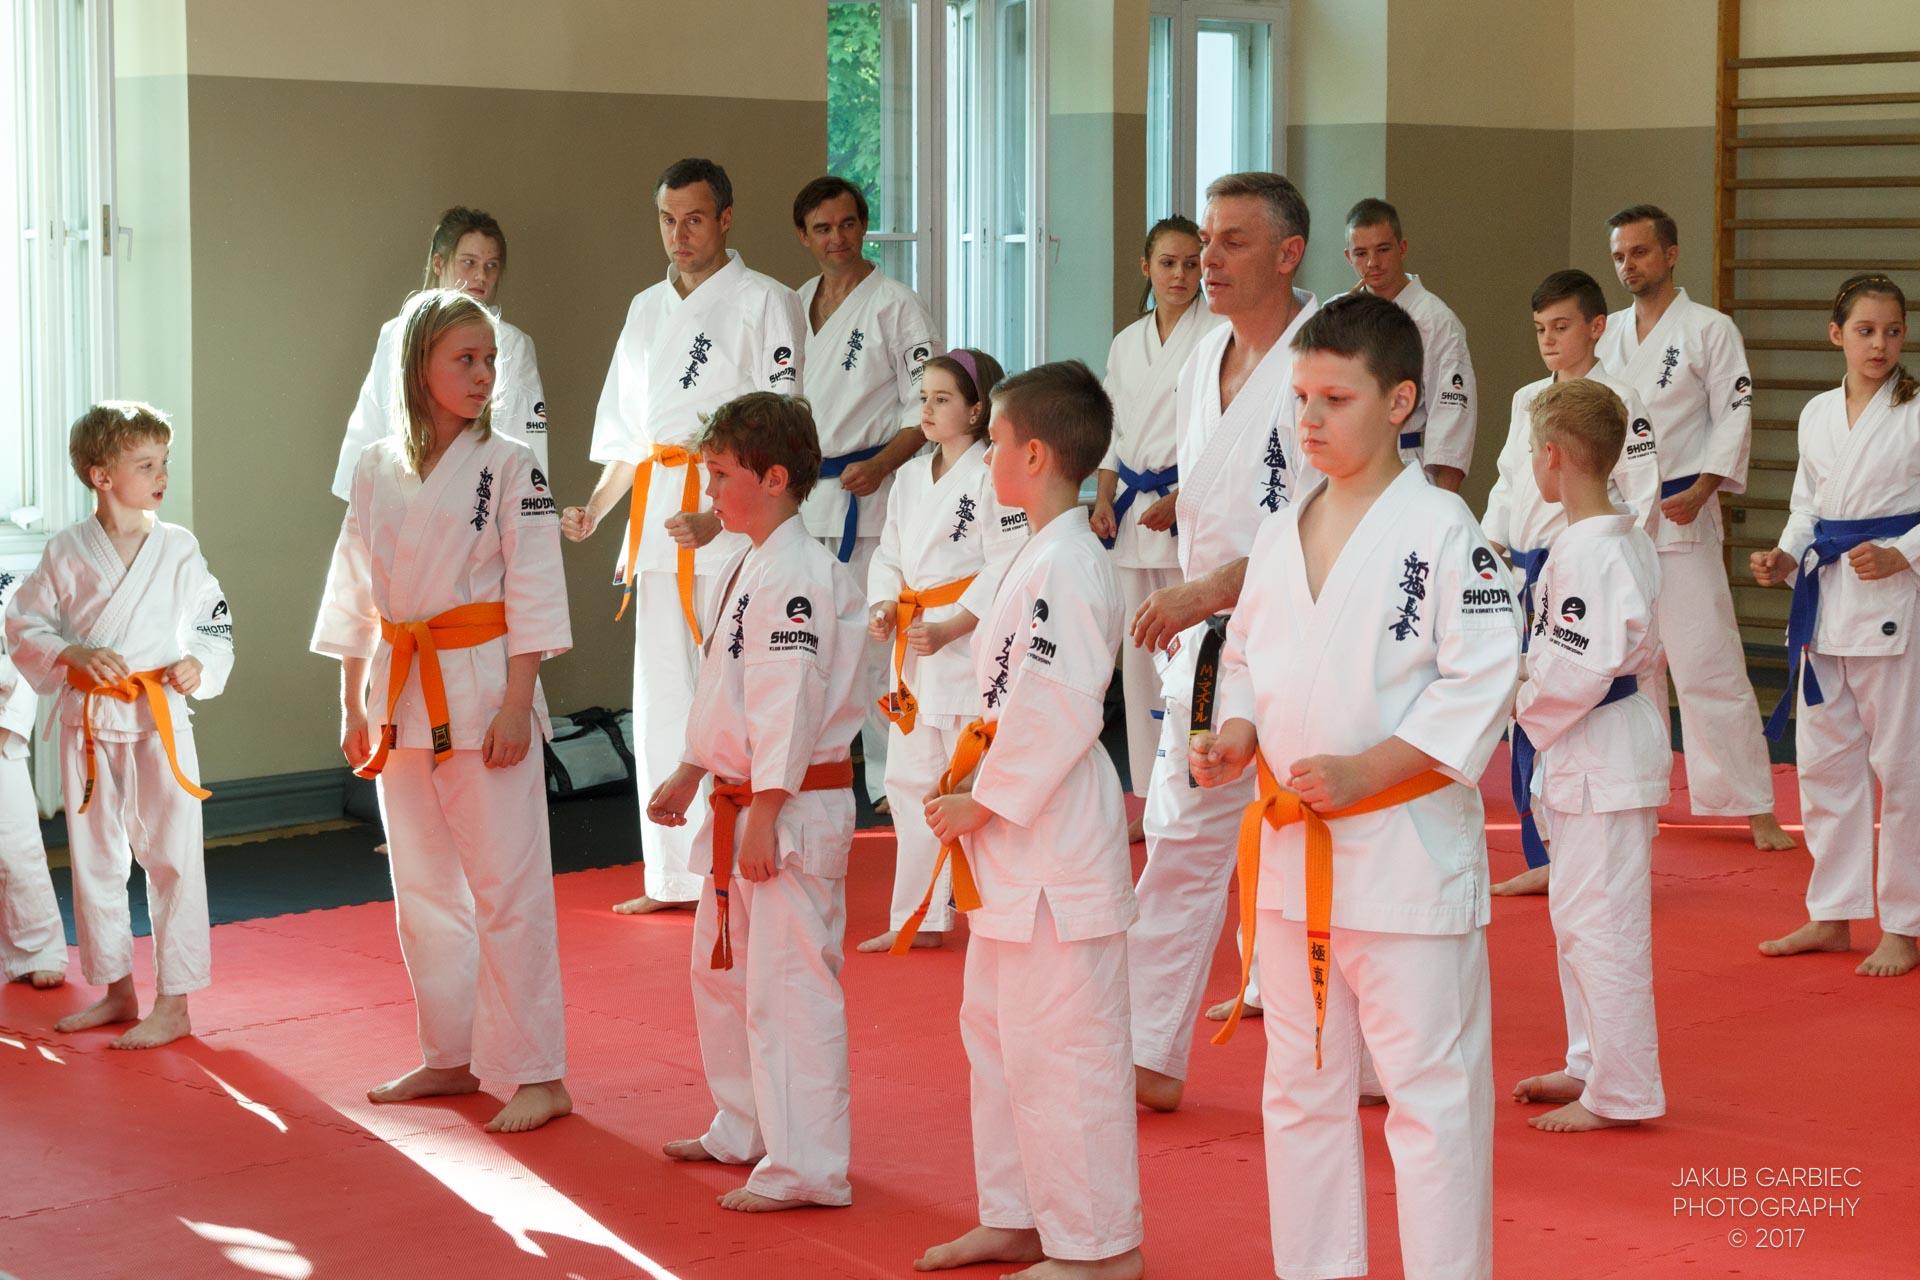 egzamin-karate-mistrz-mariusz-mazur-klub-karate-shodan-2017-06-02-7